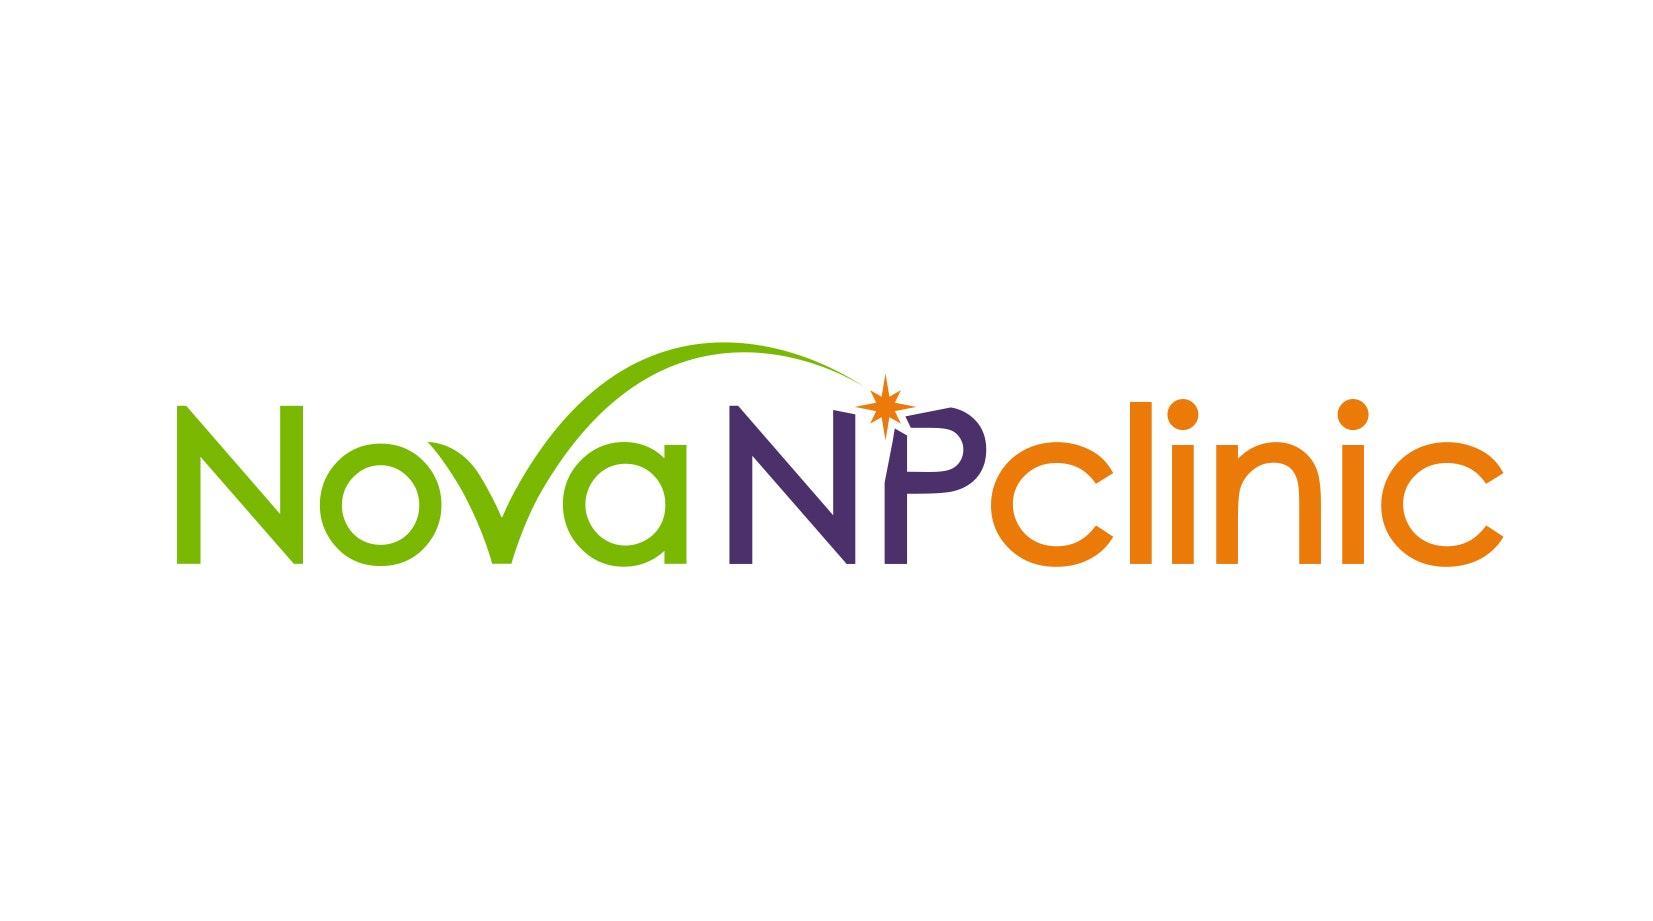 logo for Nova NP Clinic Doctors